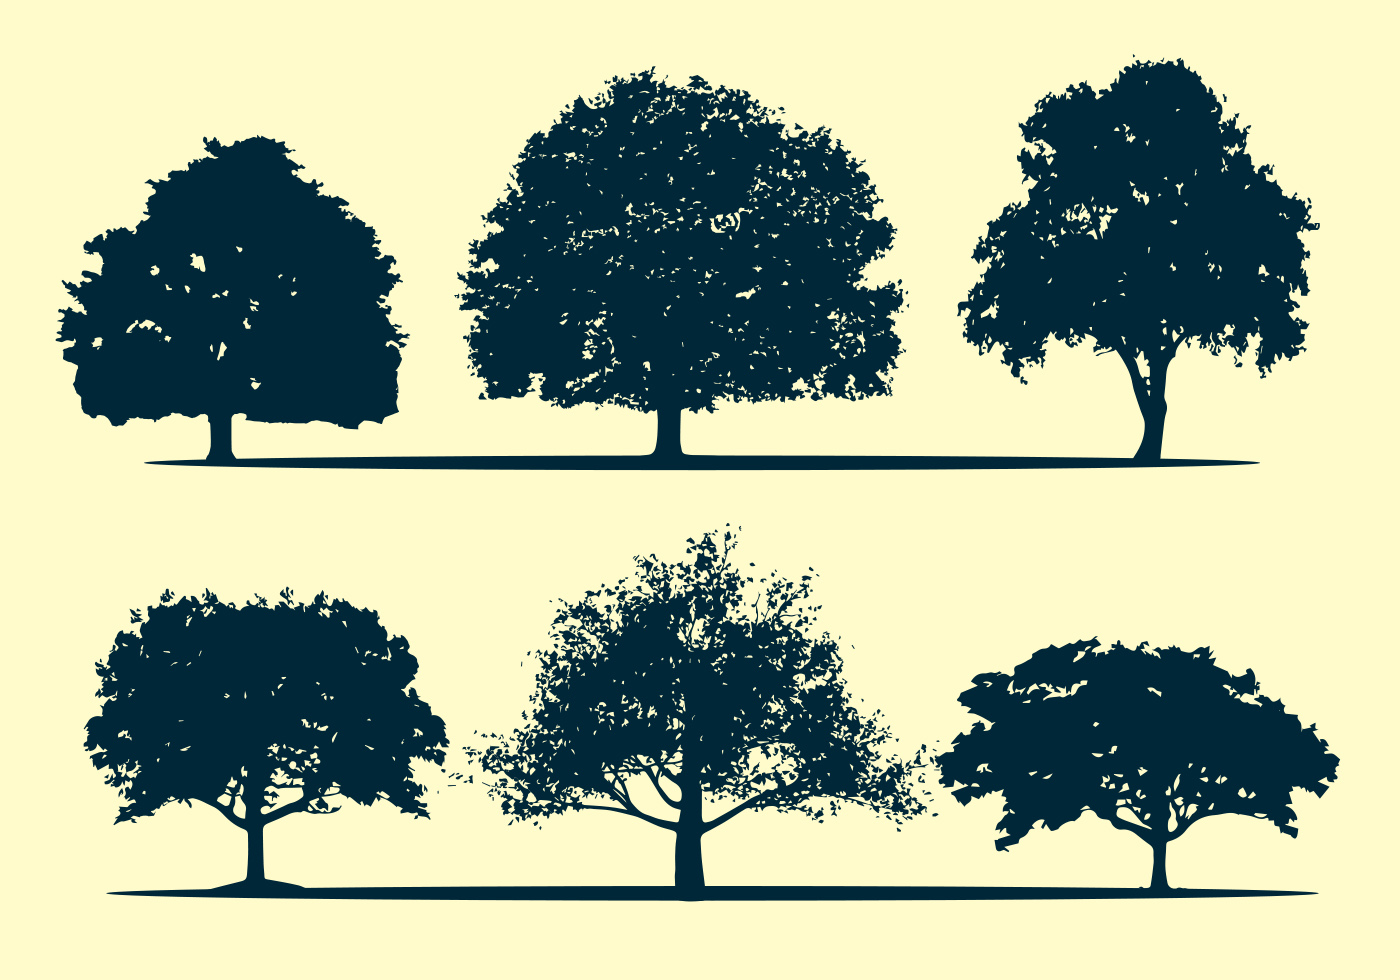 Oak tree silhouette vectors - Download Free Vector Art ...